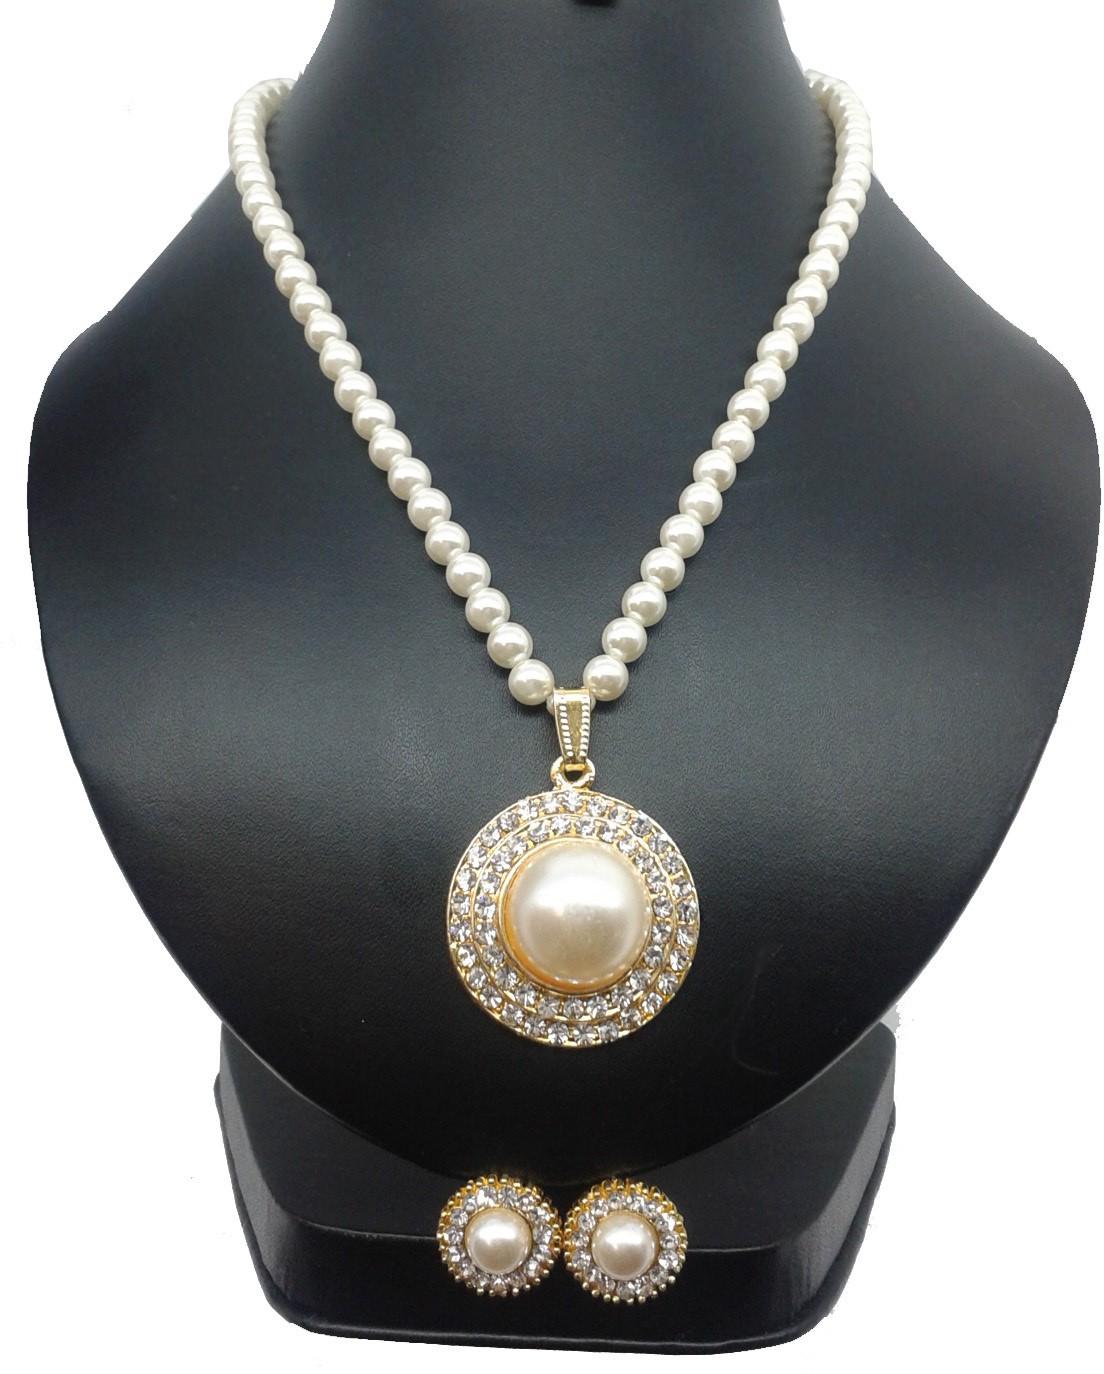 Deals - Delhi - Bead Jewellery <br> Earrings, Pendants, Necklaces<br> Category - jewellery<br> Business - Flipkart.com